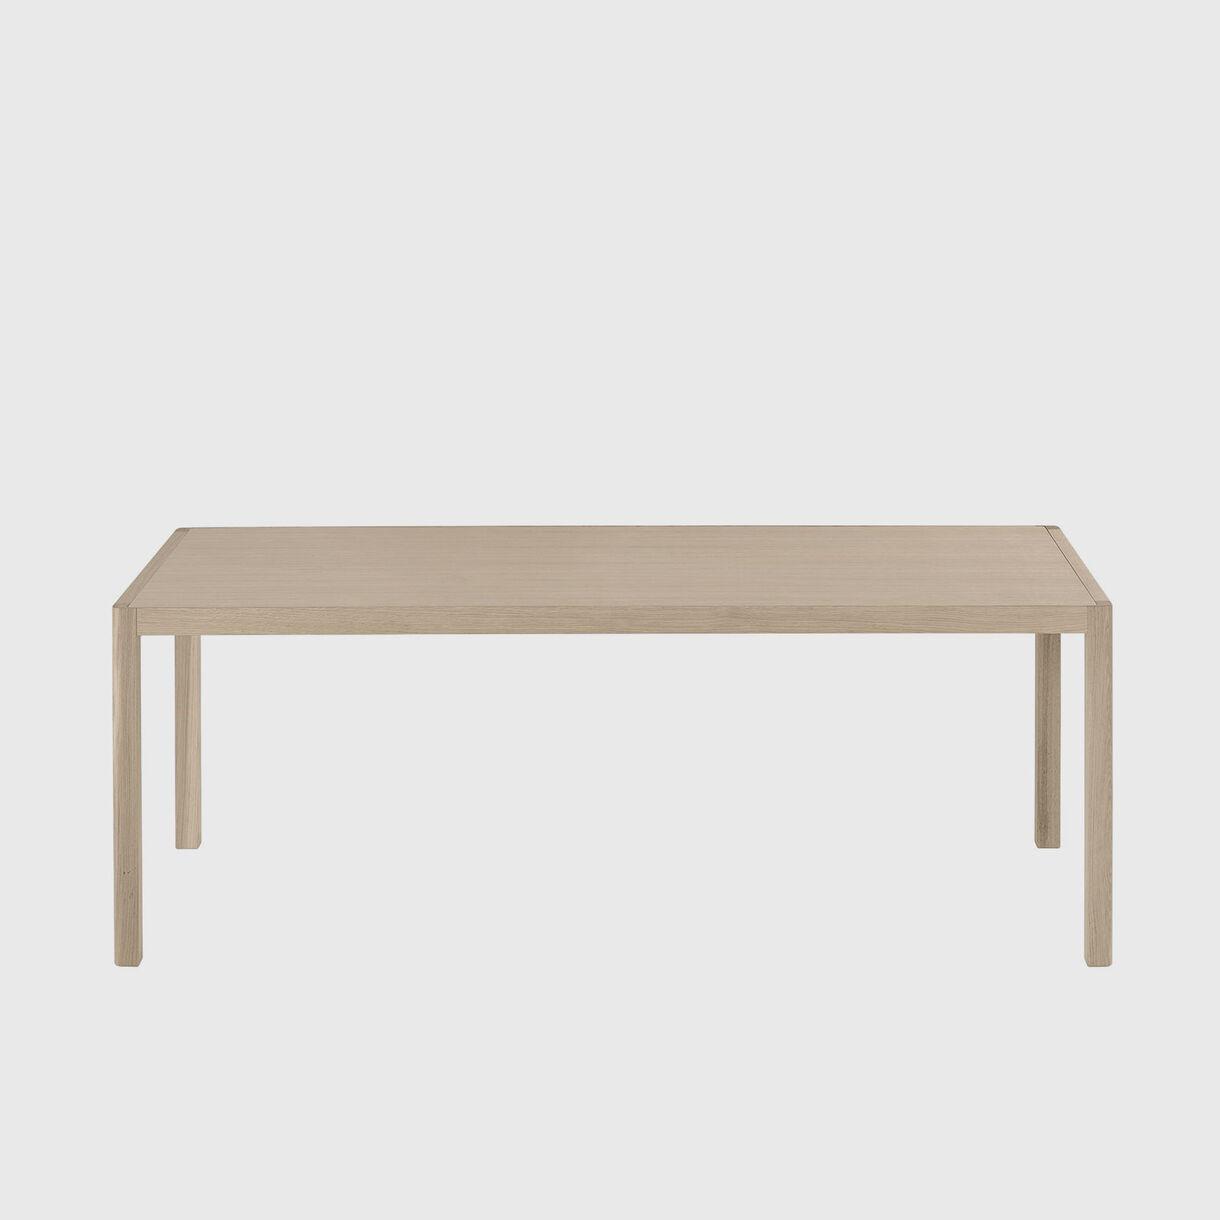 Workshop Dining Table, 2000 x 920, Oak